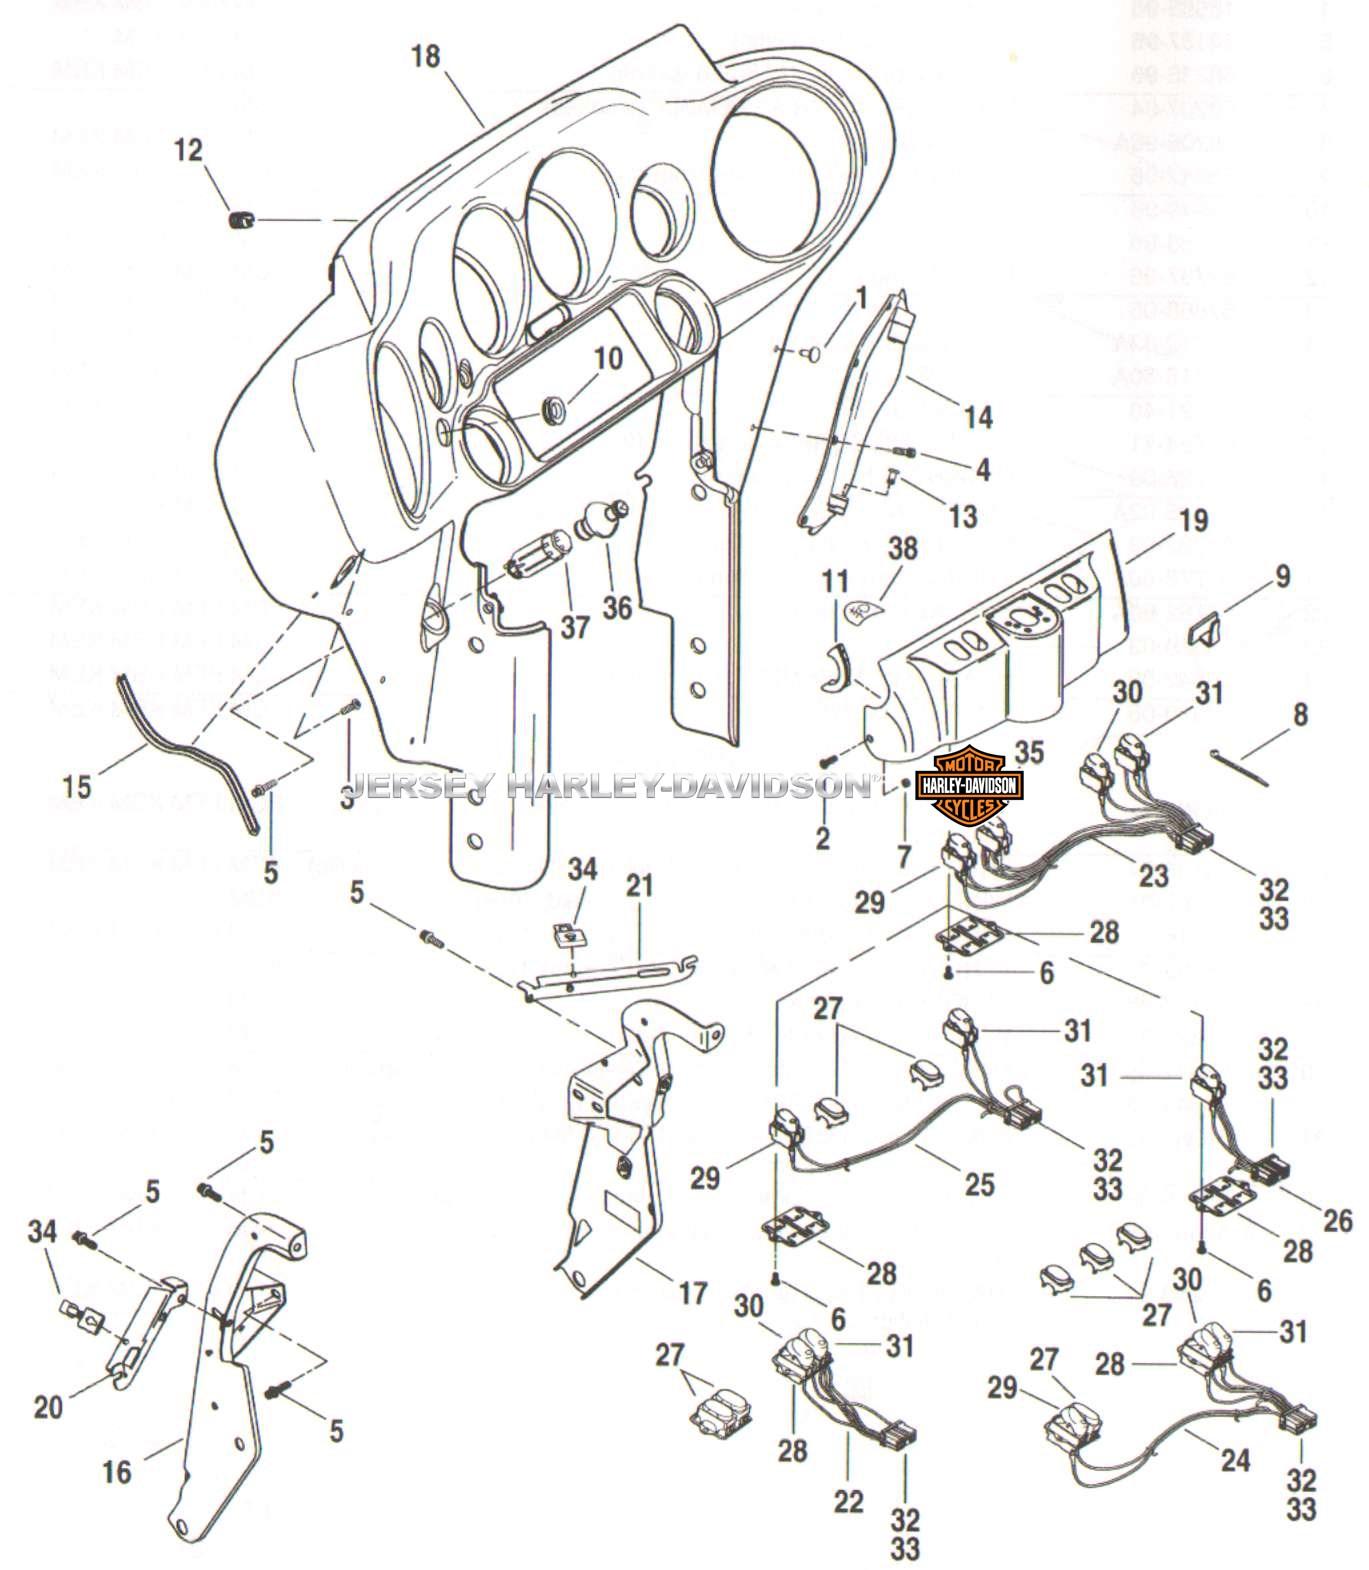 Fantastic 2012 harley fltrx wiring harness diagram gallery harley tachometer wiring boss v plow wiring